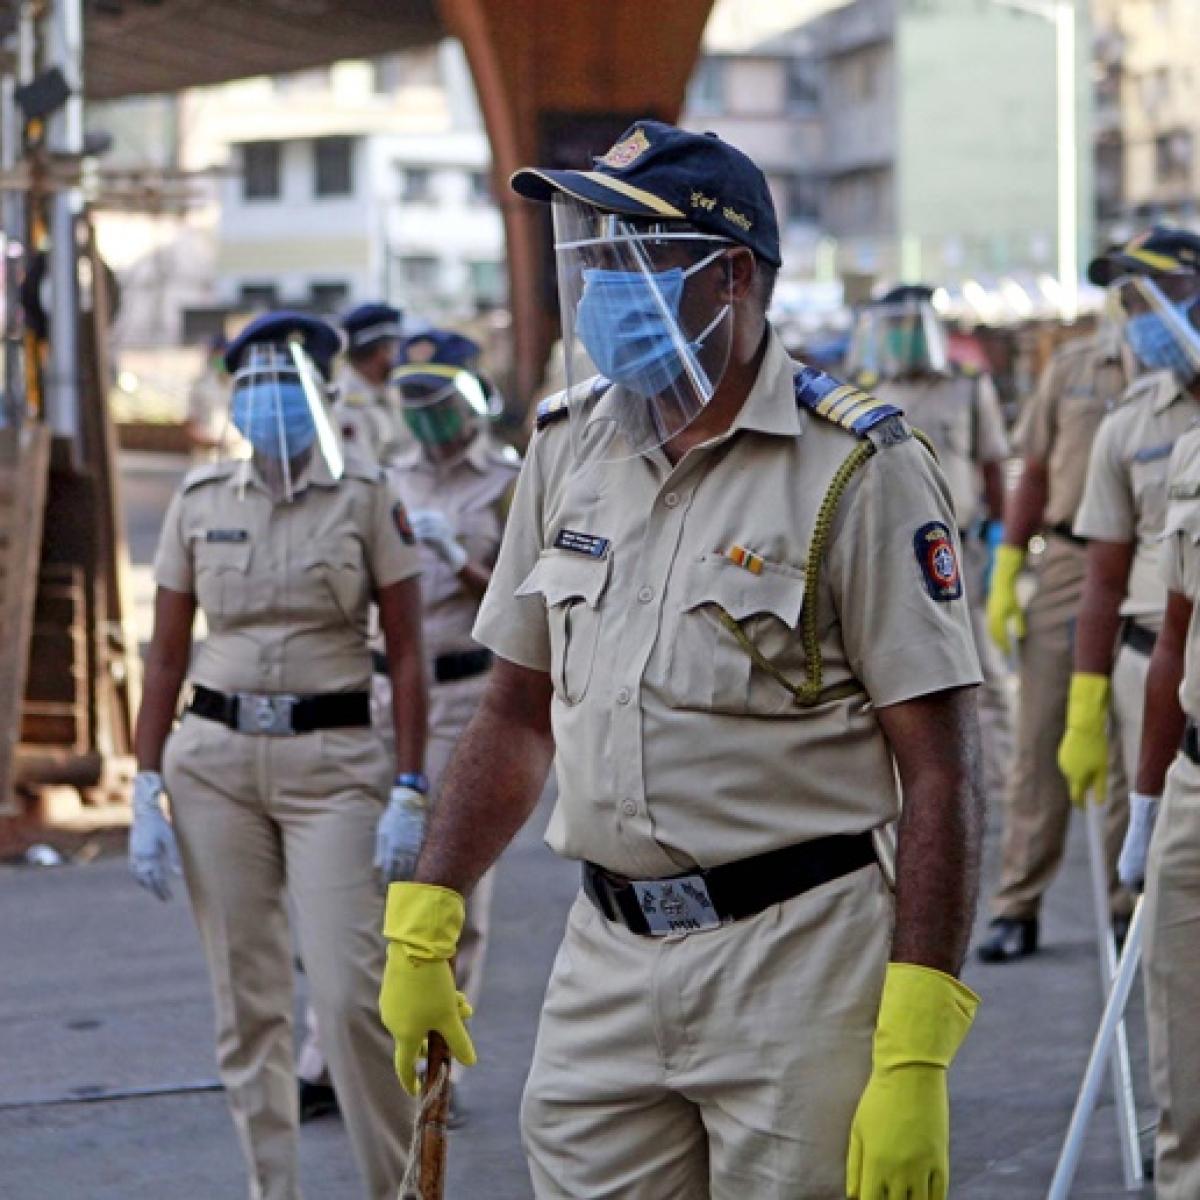 Kunal Kamra, Sonam Kapoor, Priyanka Chaturvedi appeal for masks for Mumbai Police: Here's how one can donate